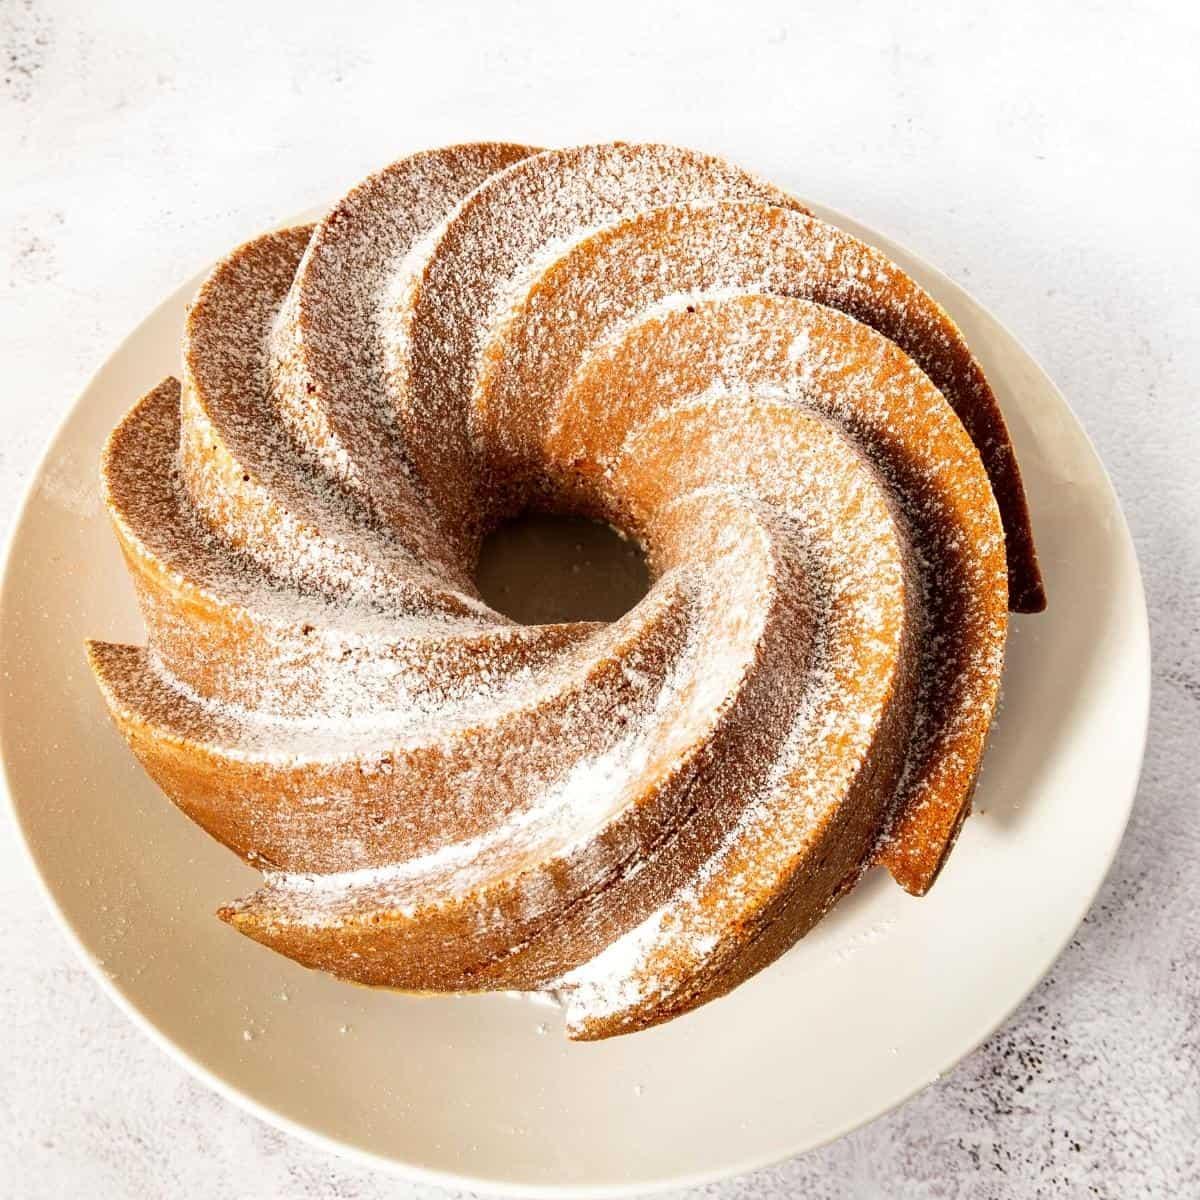 A bundt cake on a white plate.